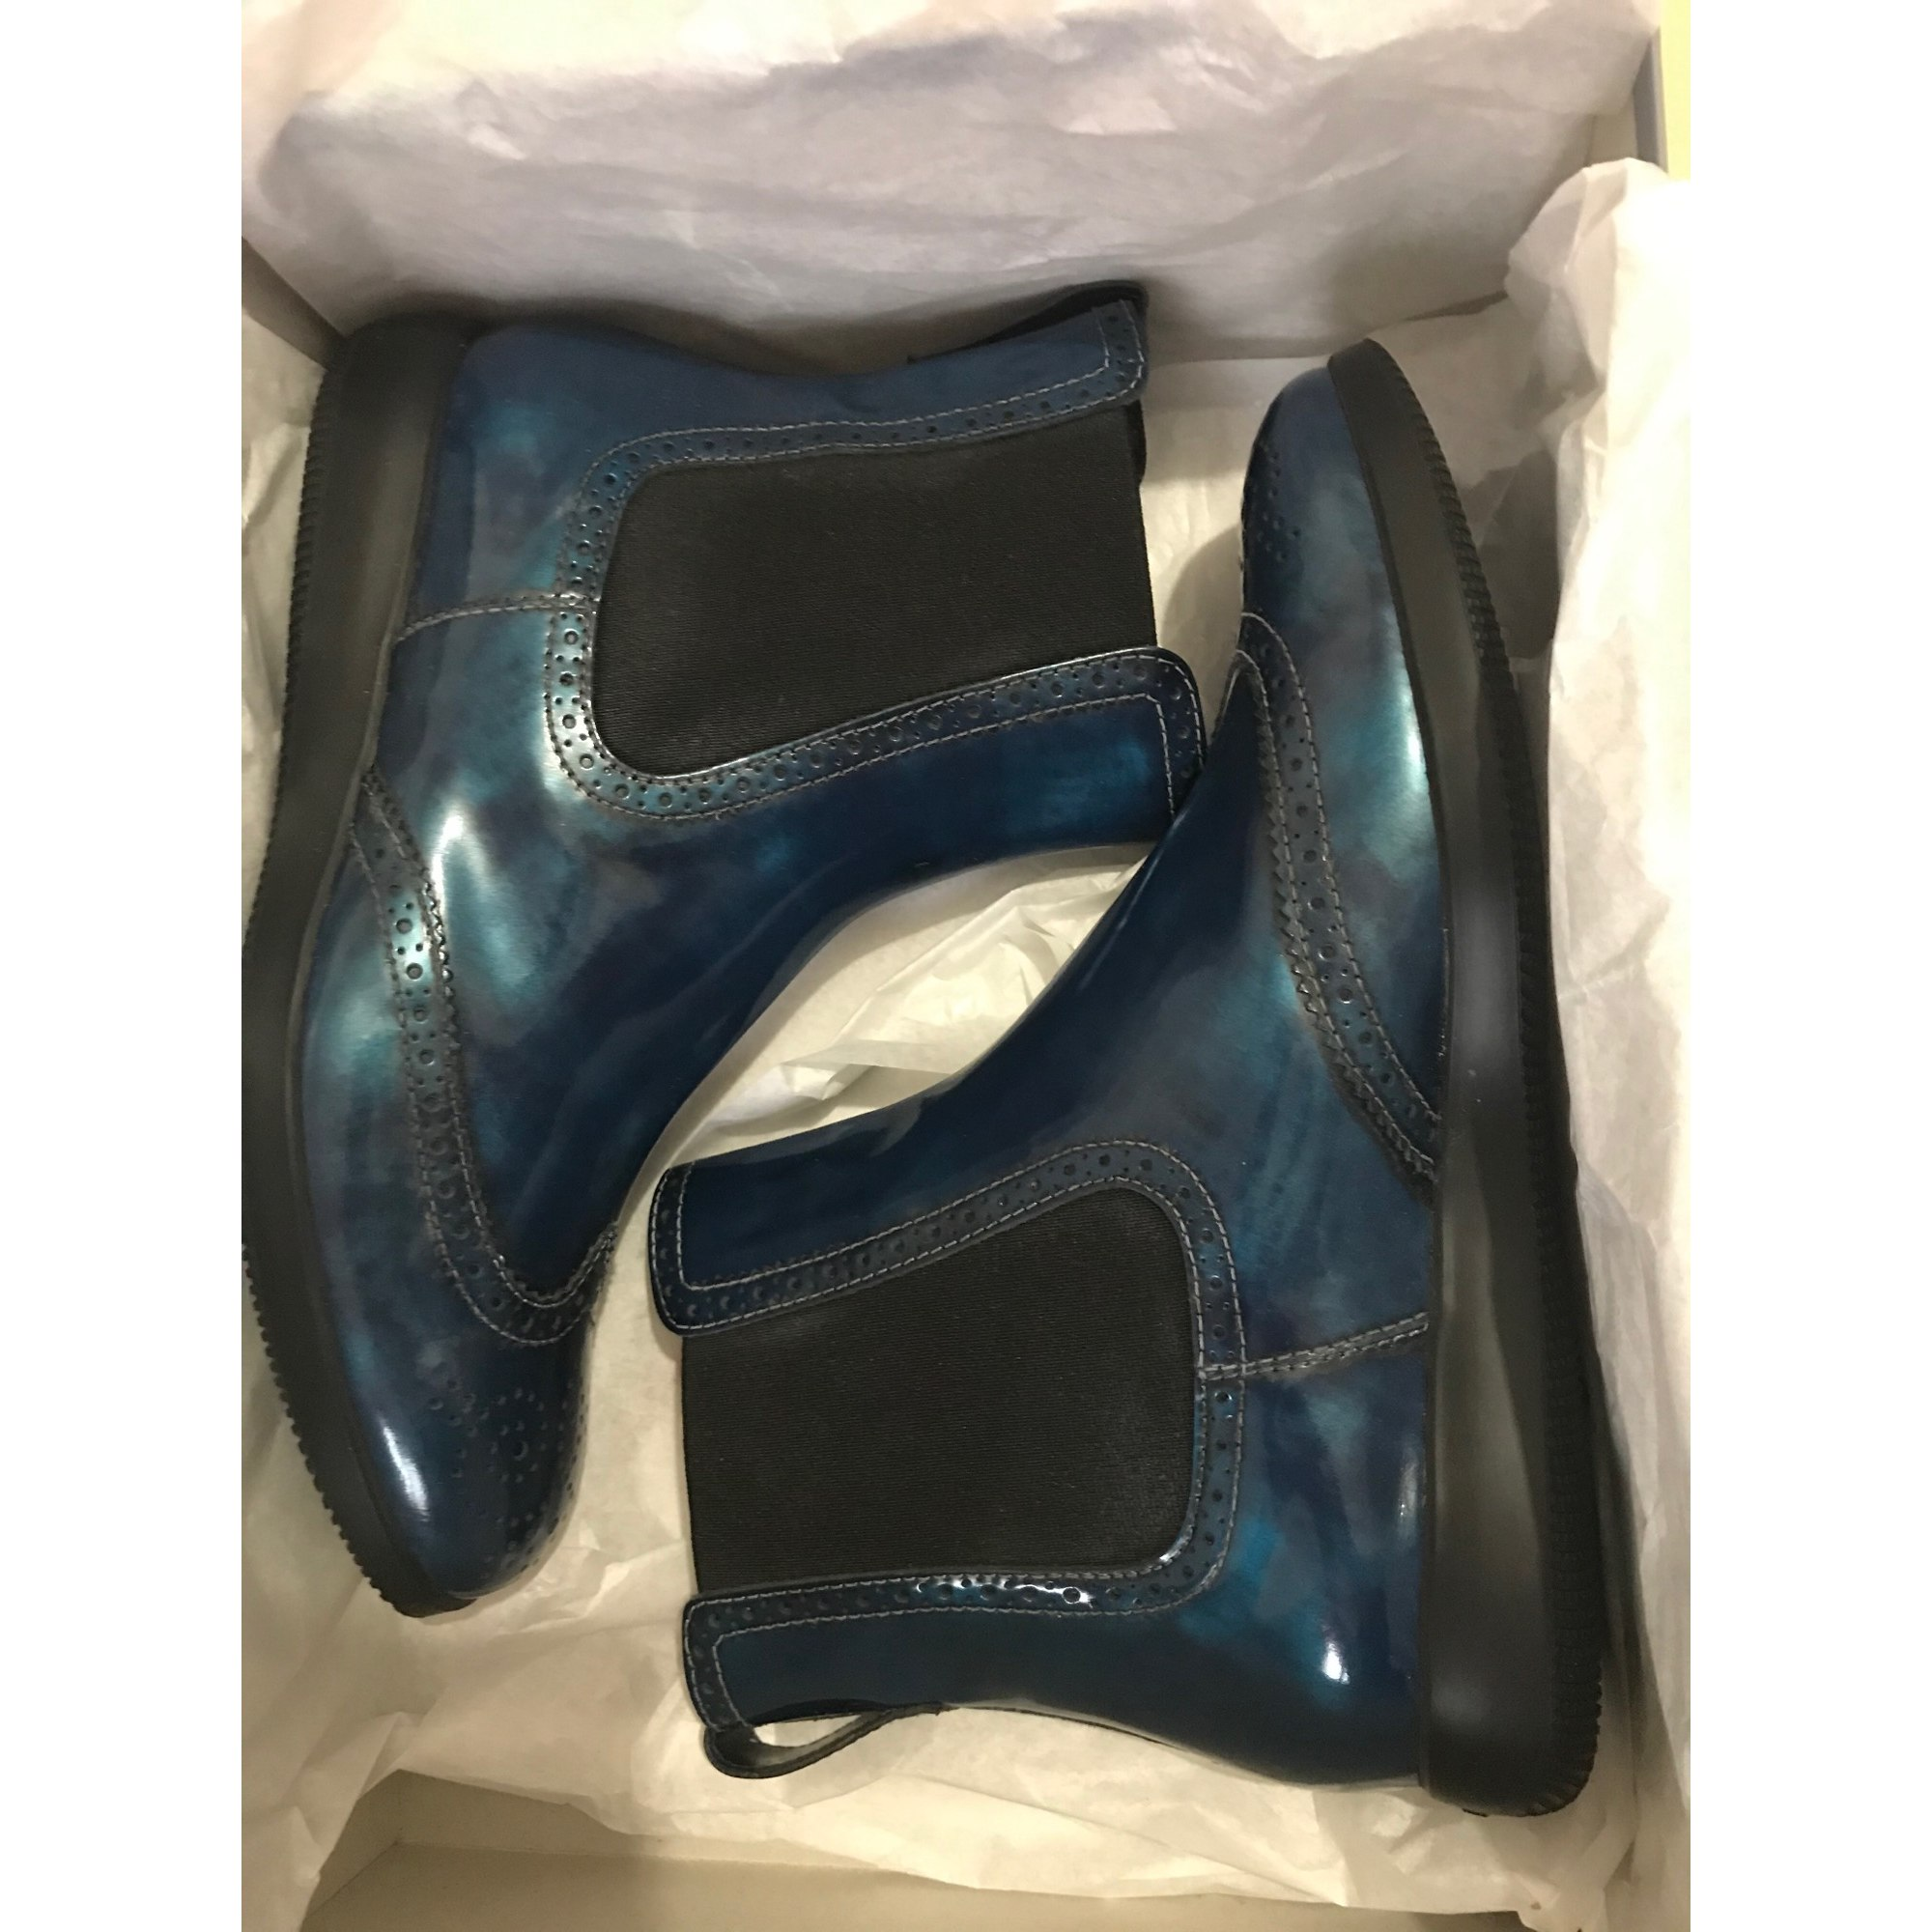 Bottines & low boots plates HOGAN Bleu, bleu marine, bleu turquoise